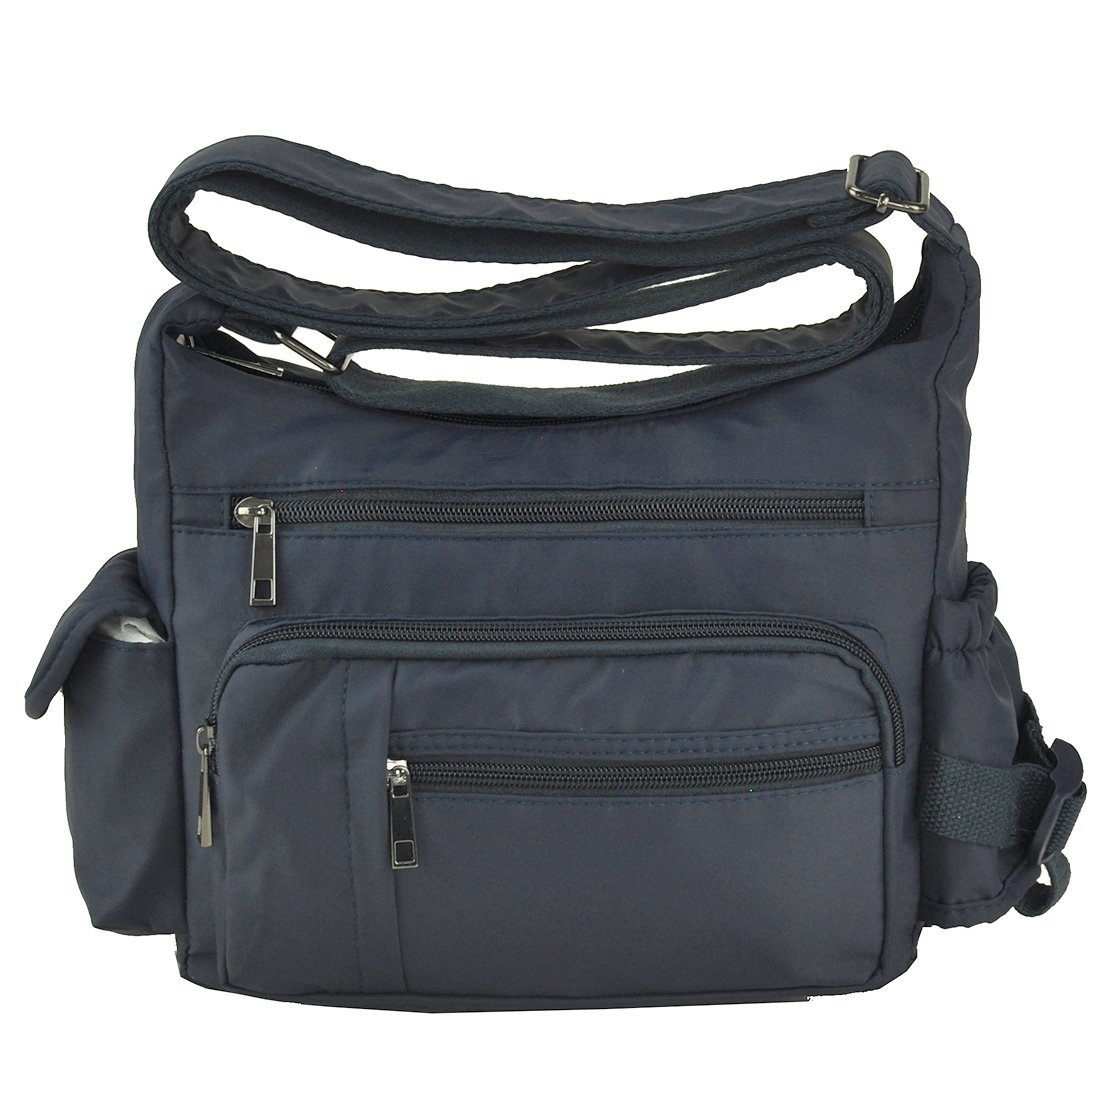 Volcanic Rock Shoulder Bags Messenger Handbags Multi Pocket Waterproof Crossbody Bags(6068-Blue) by Volcanic Rock